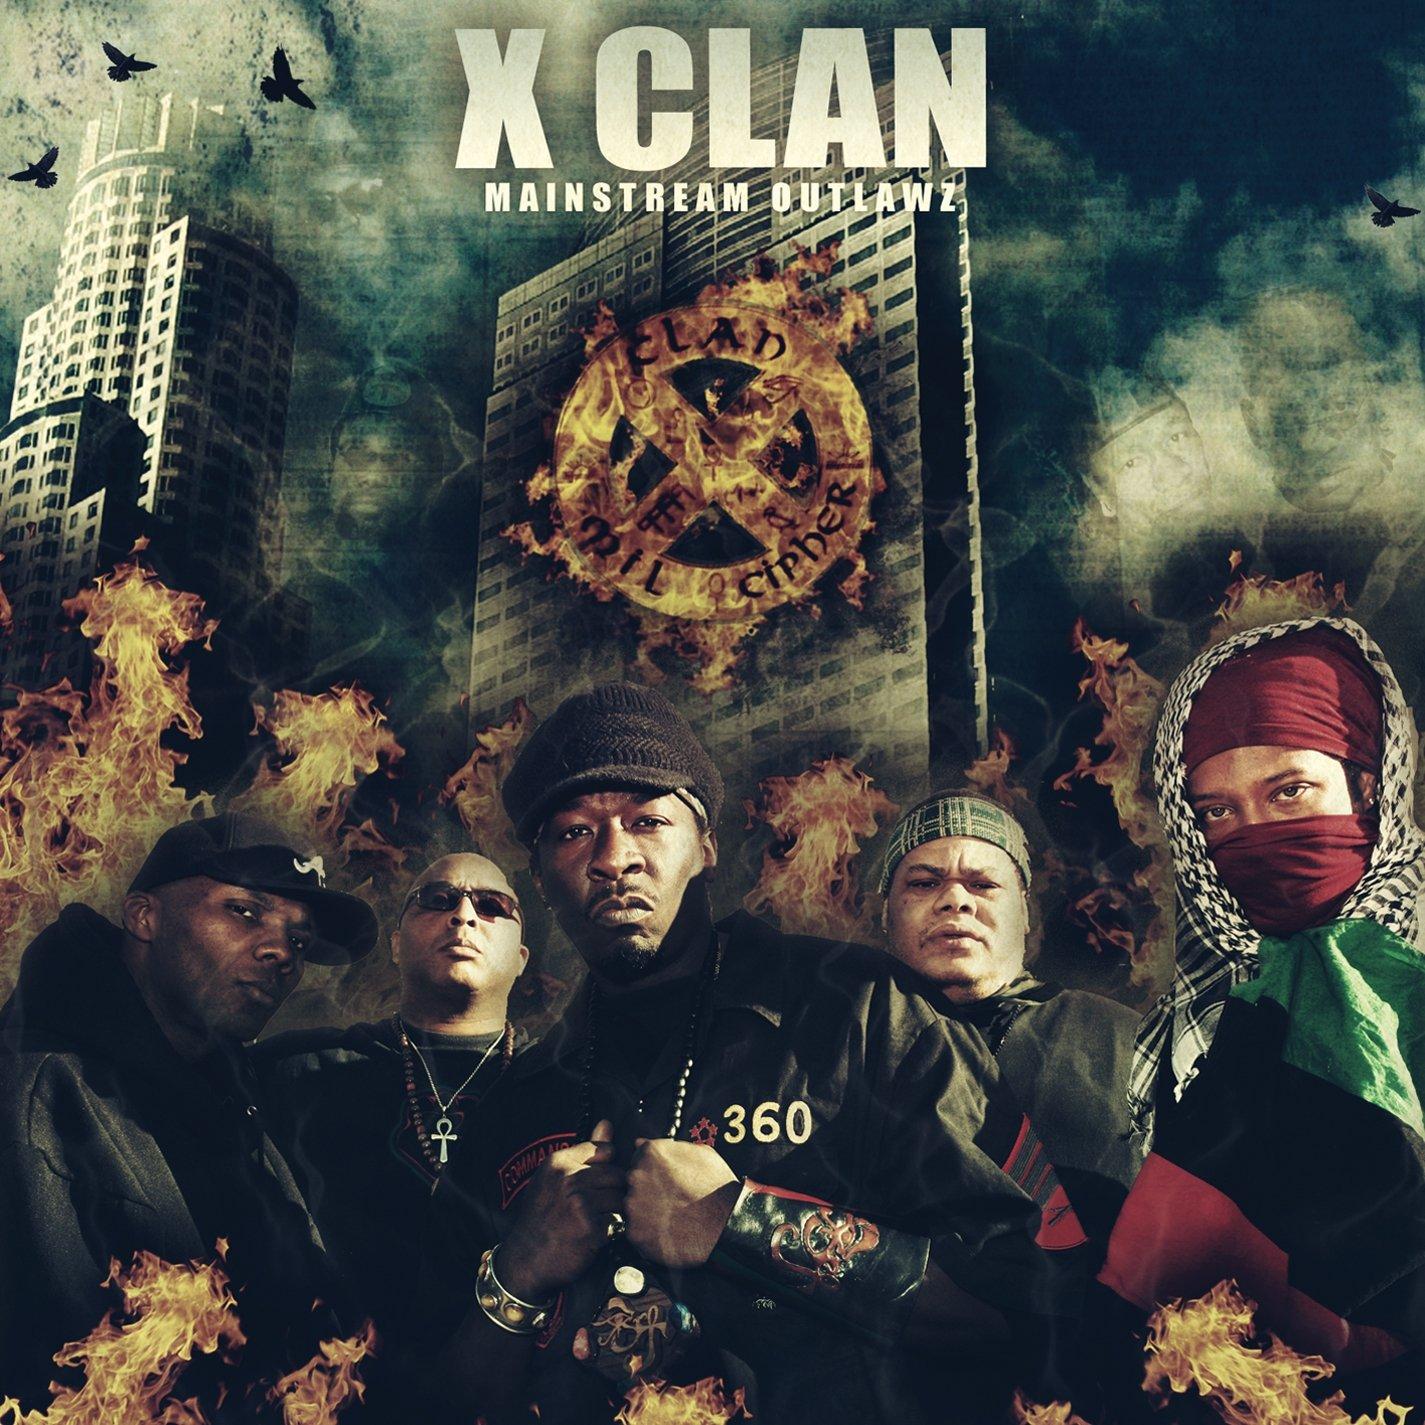 X Clan Mainstream Outlawz